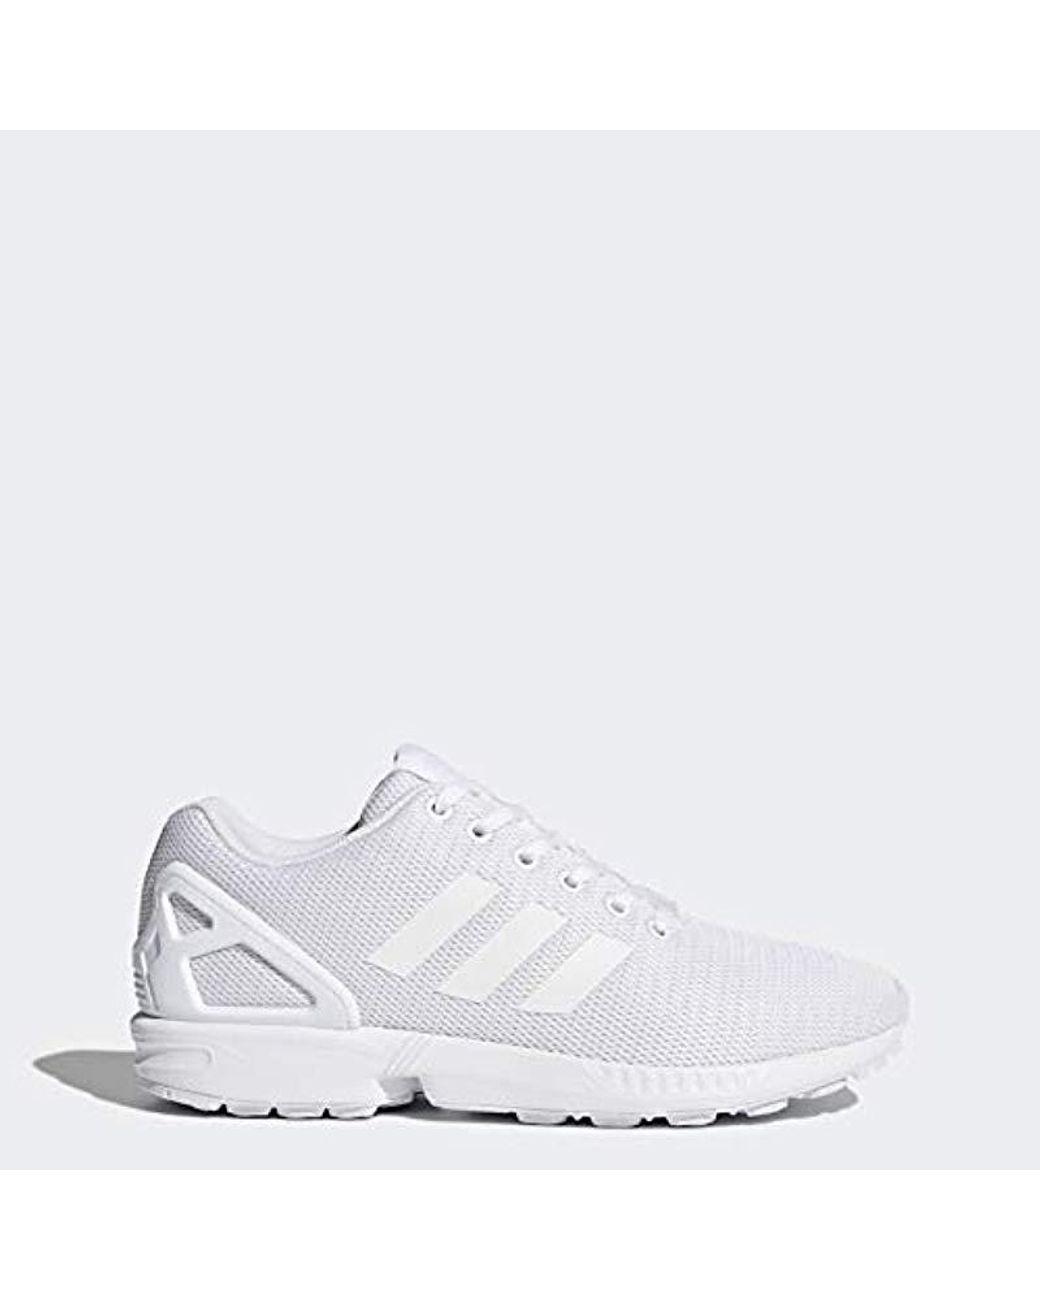 adidas originals zx flux seasonal sneaker